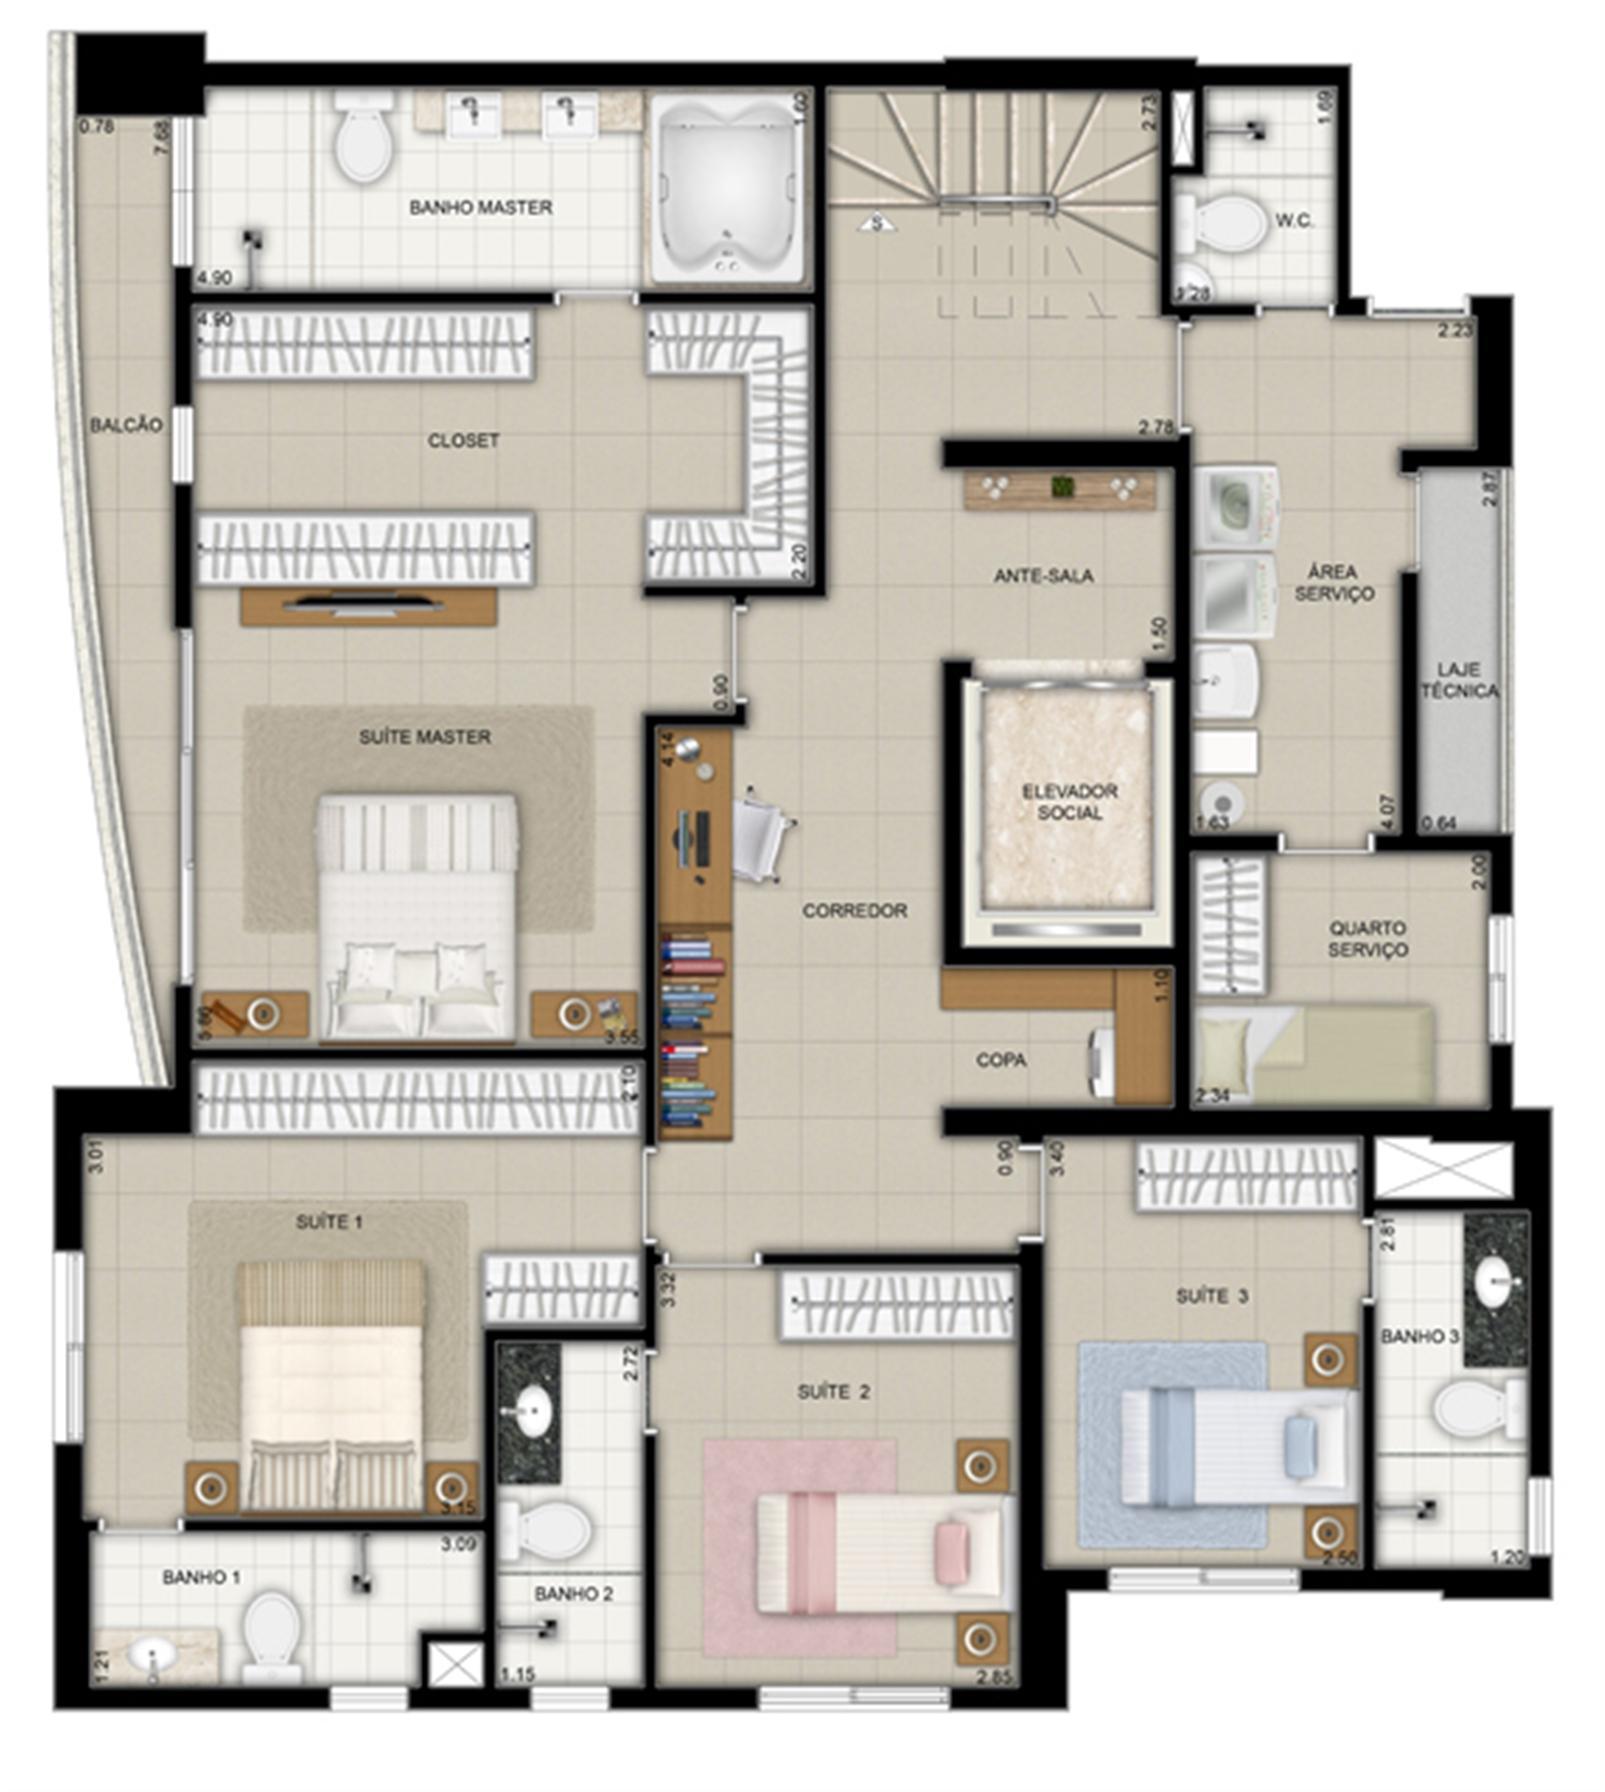 Planta duplex inferior final 2 | Domani LifeStyle – Apartamentono  Setor Marista - Goiânia - Goiás